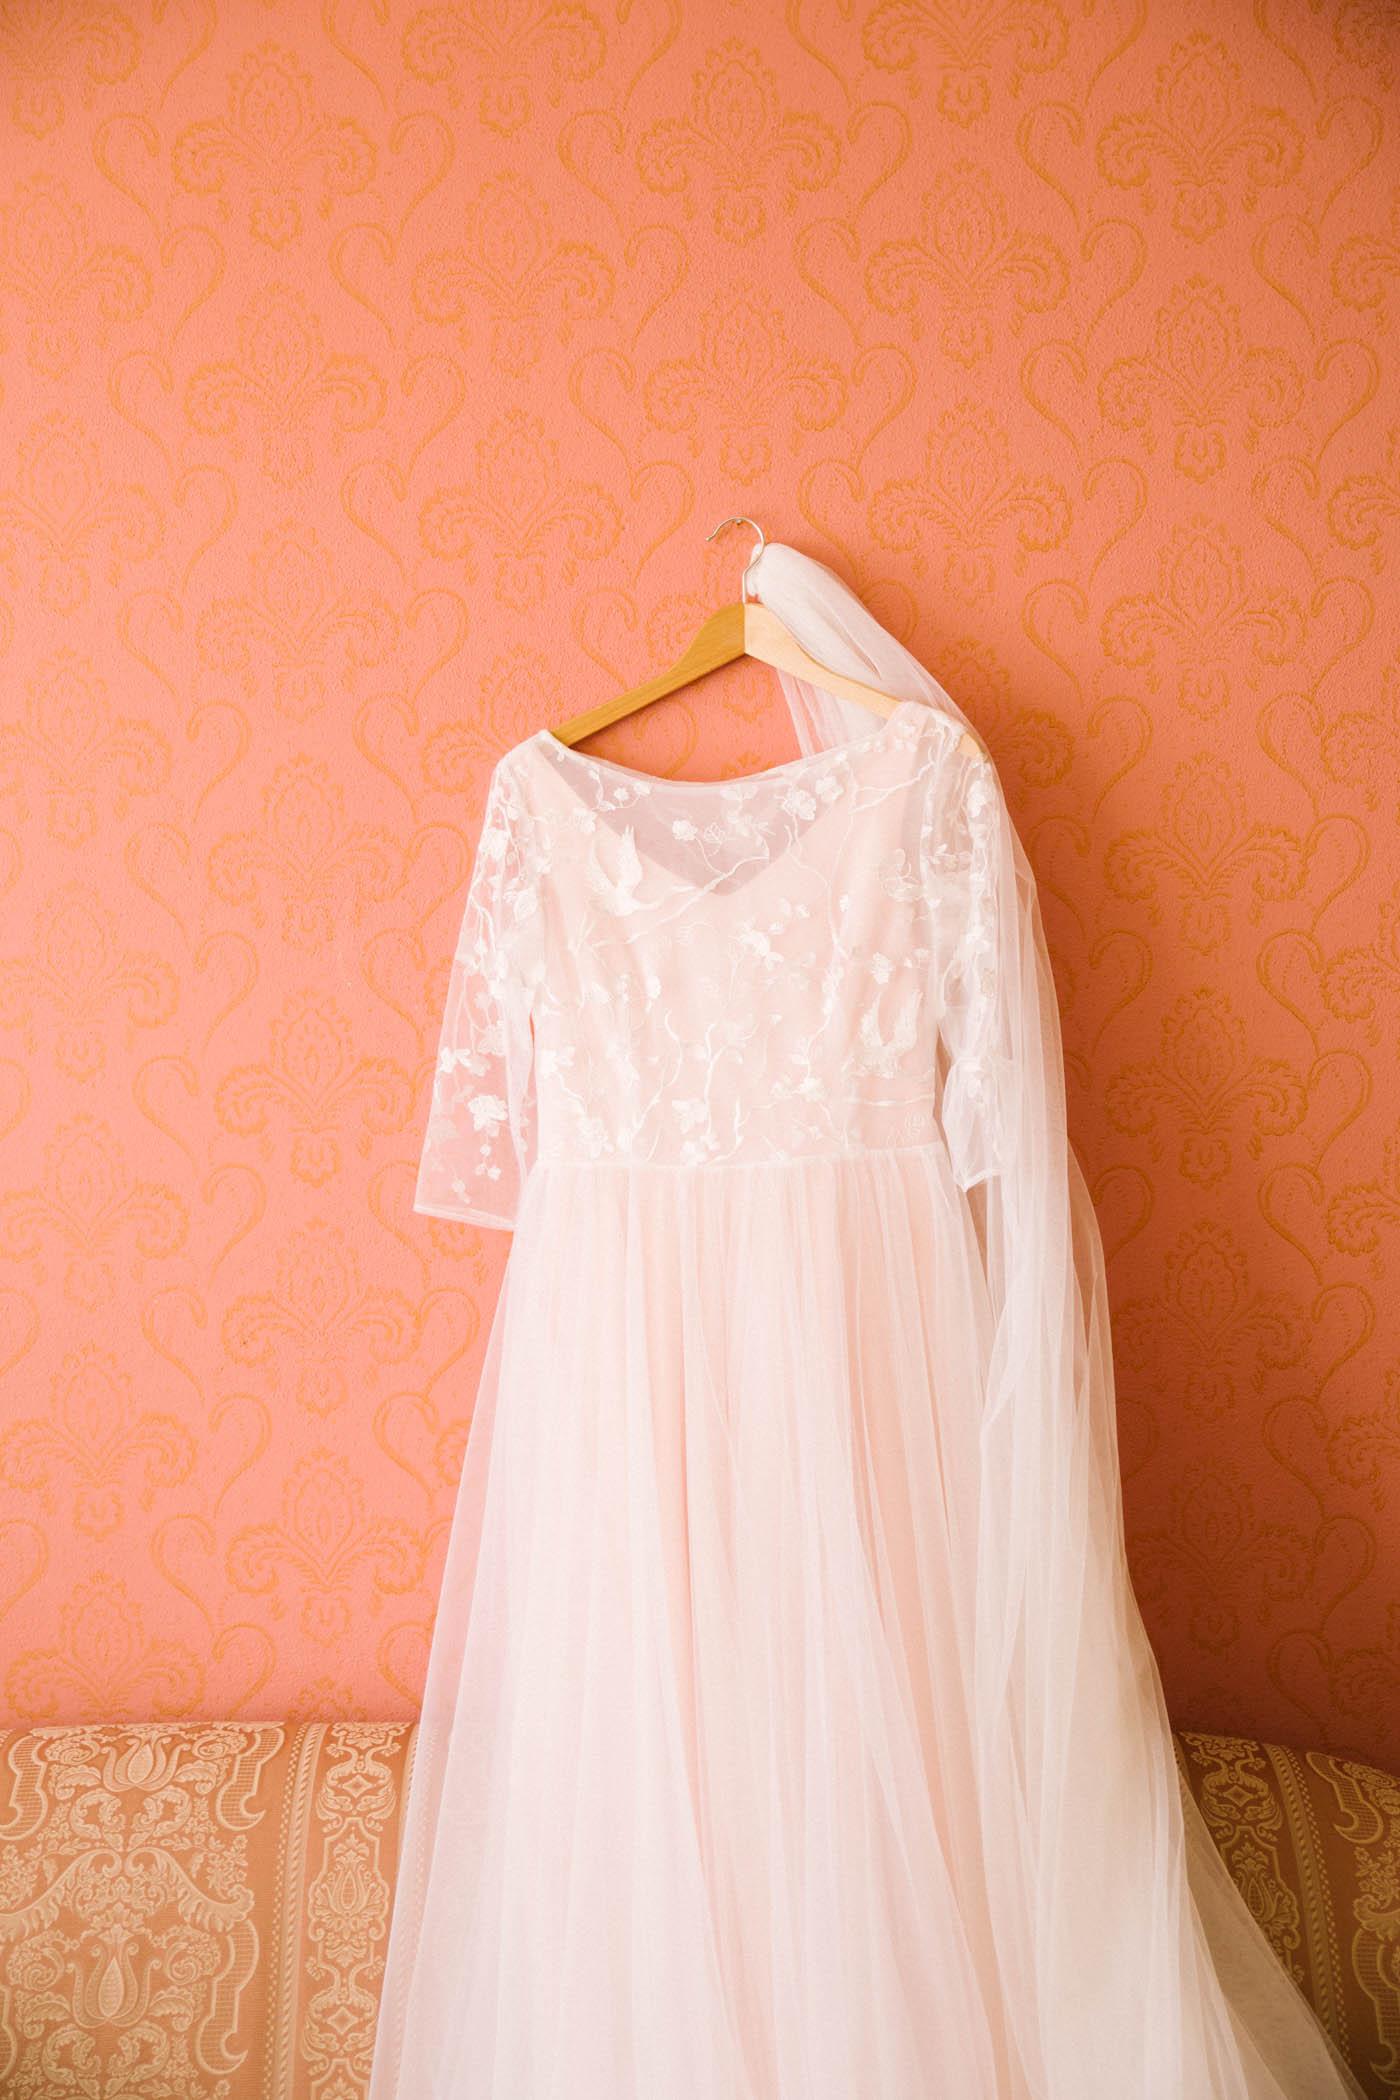 Ruzove svatebni saty | Svatba Lasakuv Mlyn